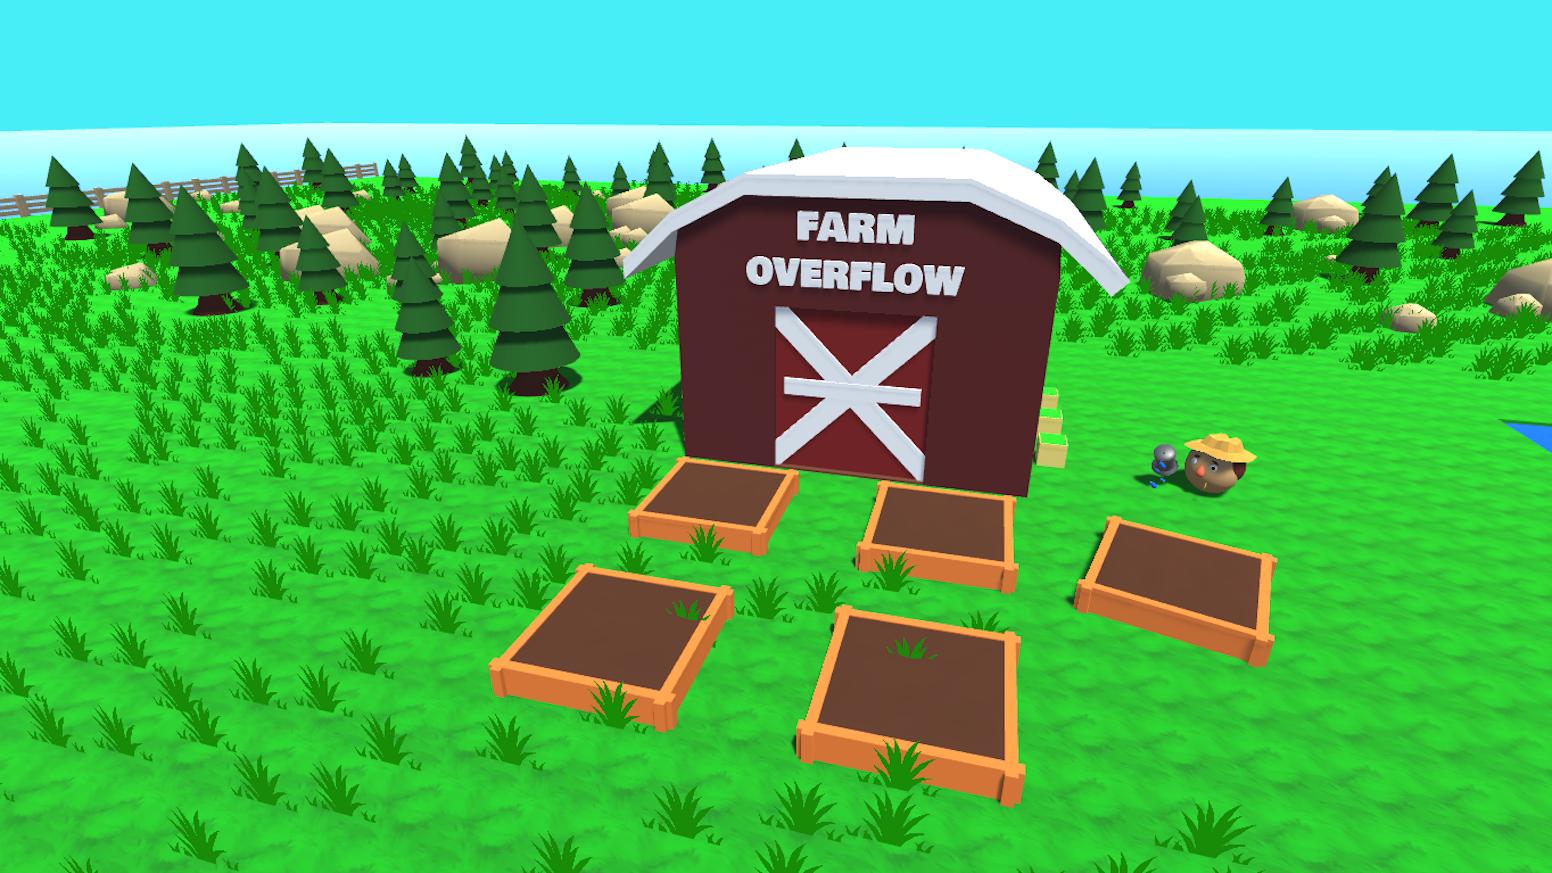 Farm Overflow: A Calm, Fast Paced, Farming Simulation! by